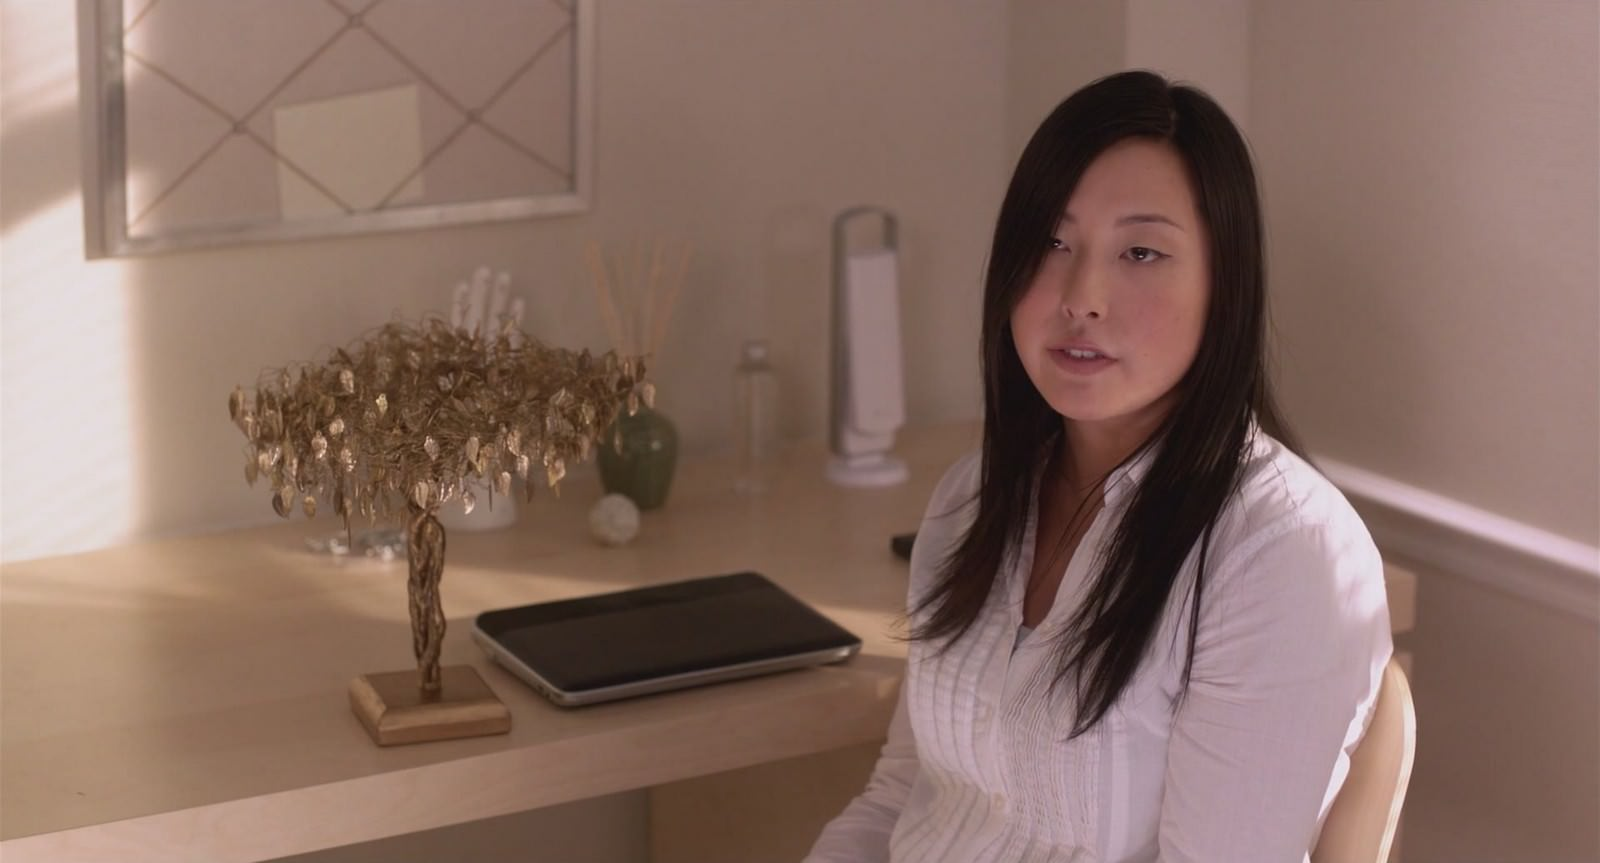 Movie, Pitch Perfect(美國, 2012年) / 歌喉讚(台灣) / 完美音调(中國) / 辣妹合唱團(香港), 電影劇照, 角色與演員介紹